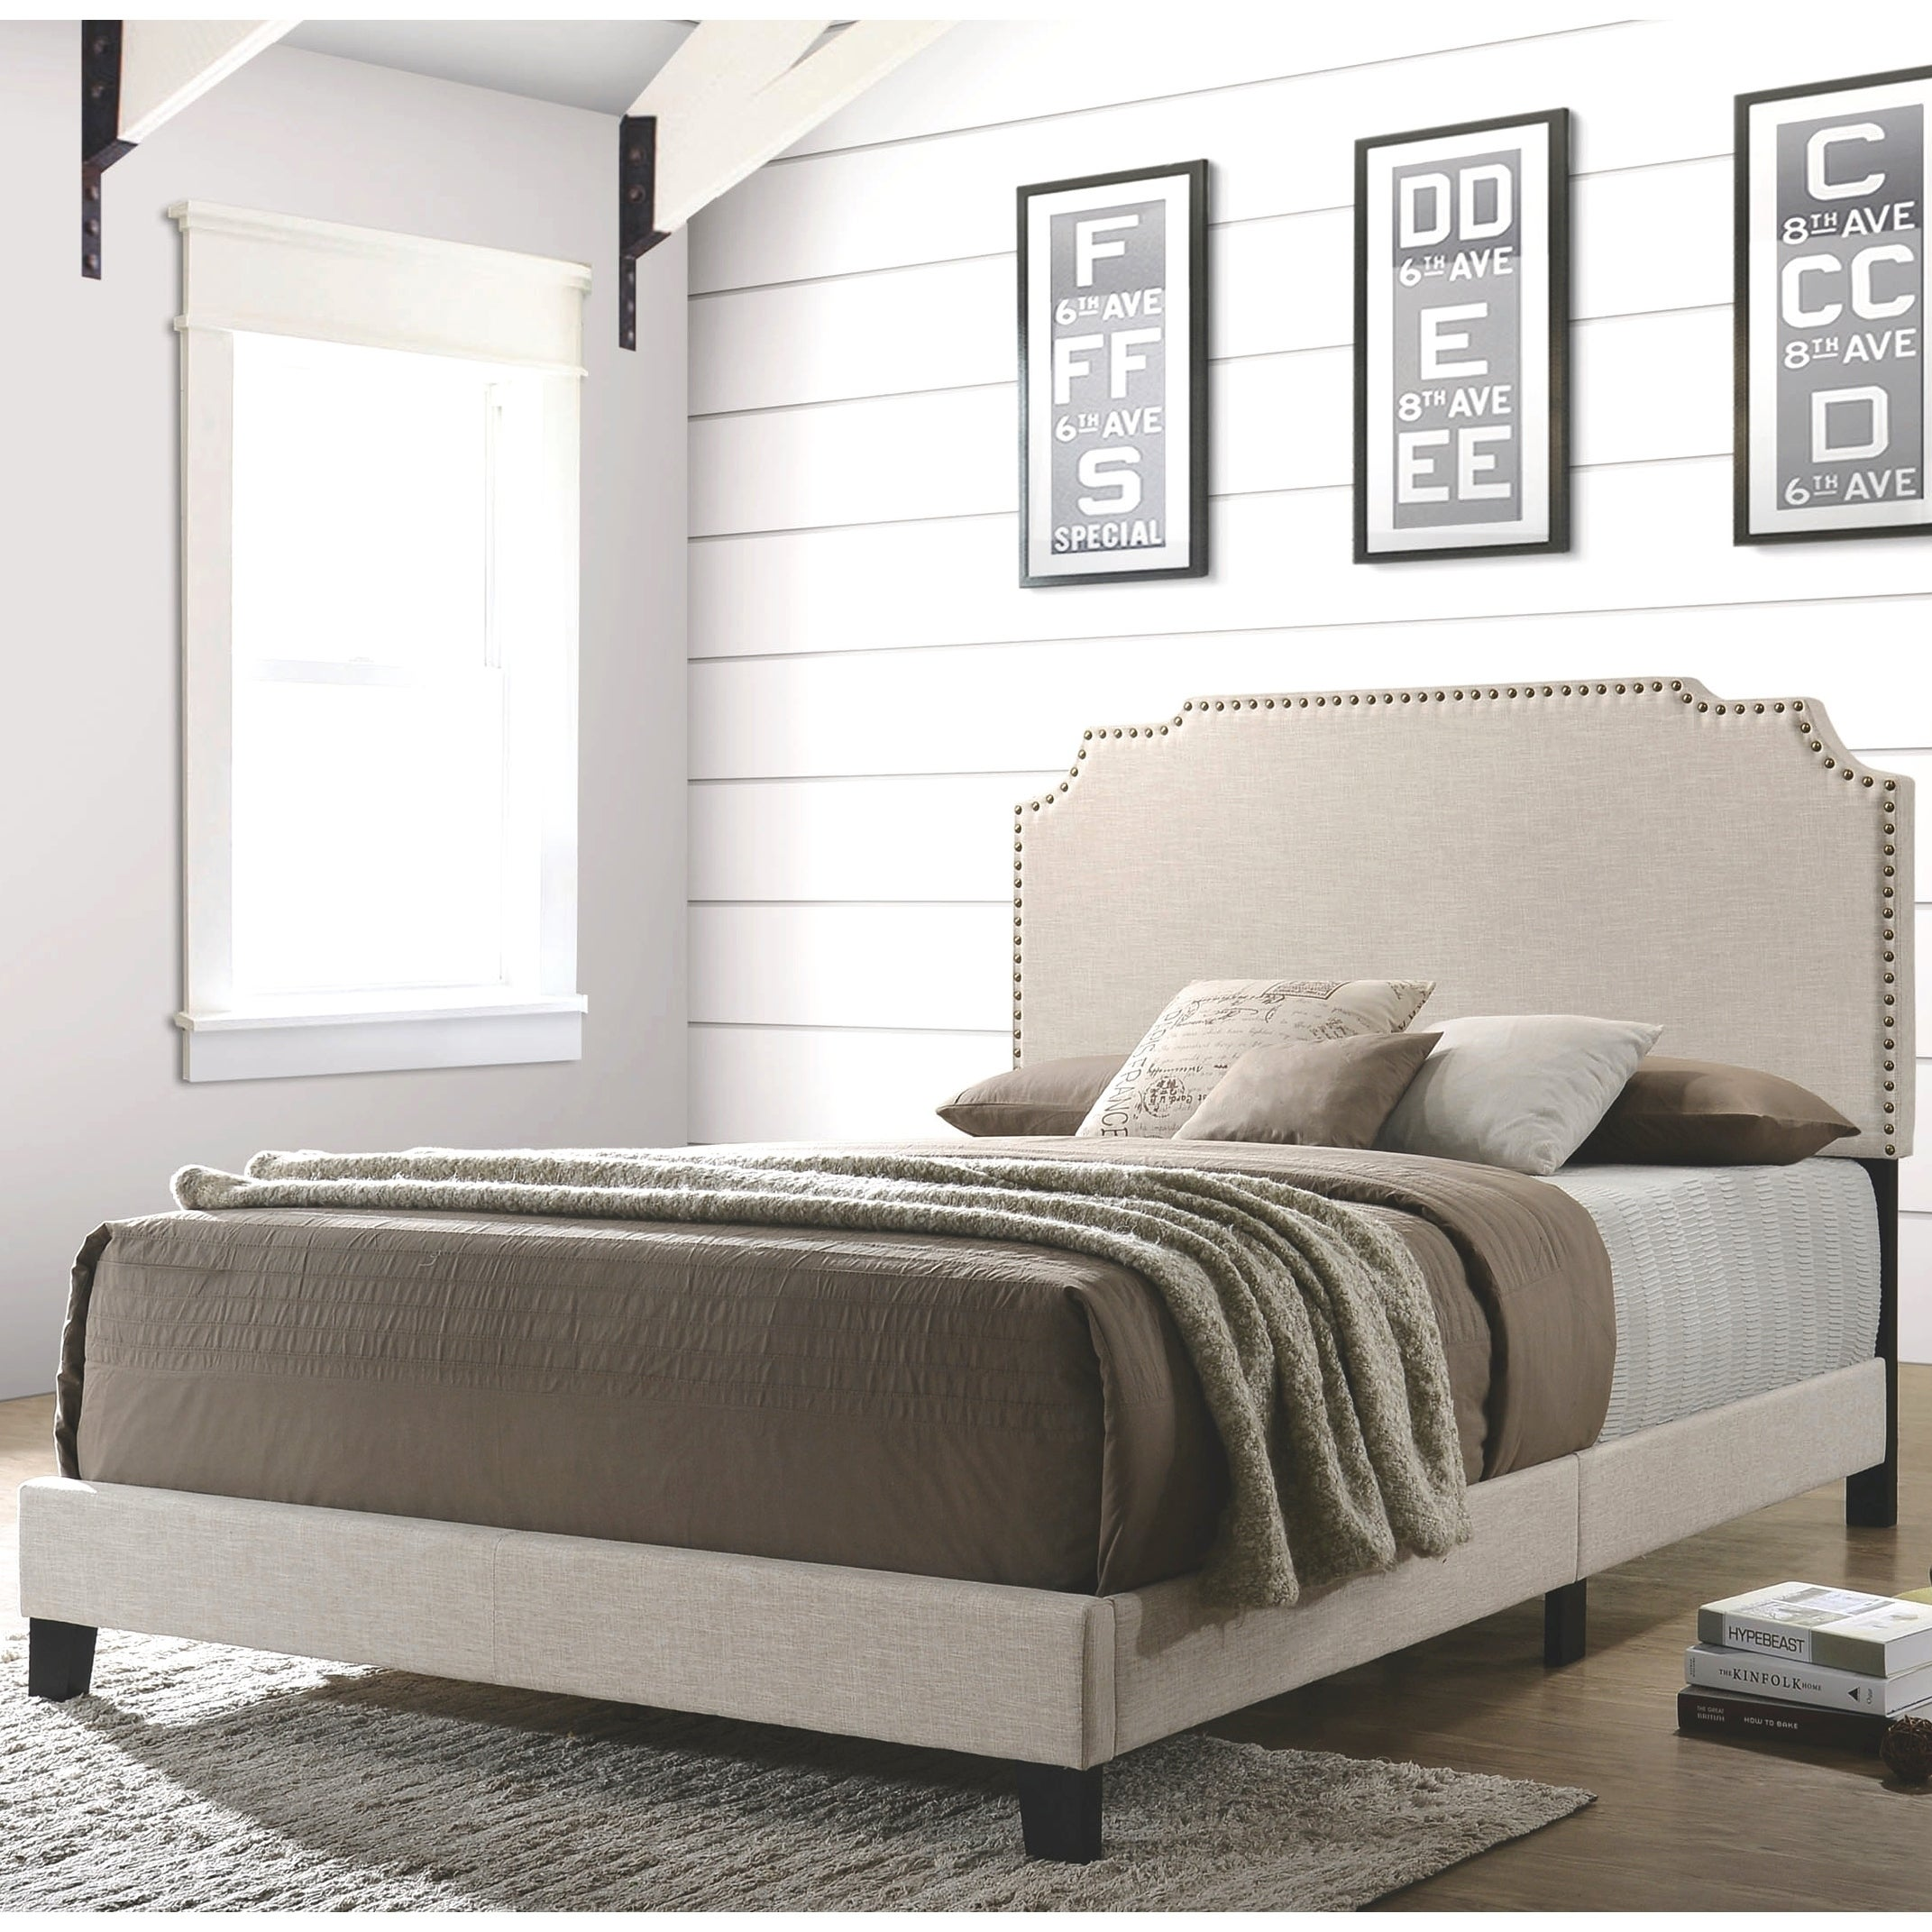 Modern Design Beige Upholstered Bed With Nailhead Trim Overstock 28264552 Queen